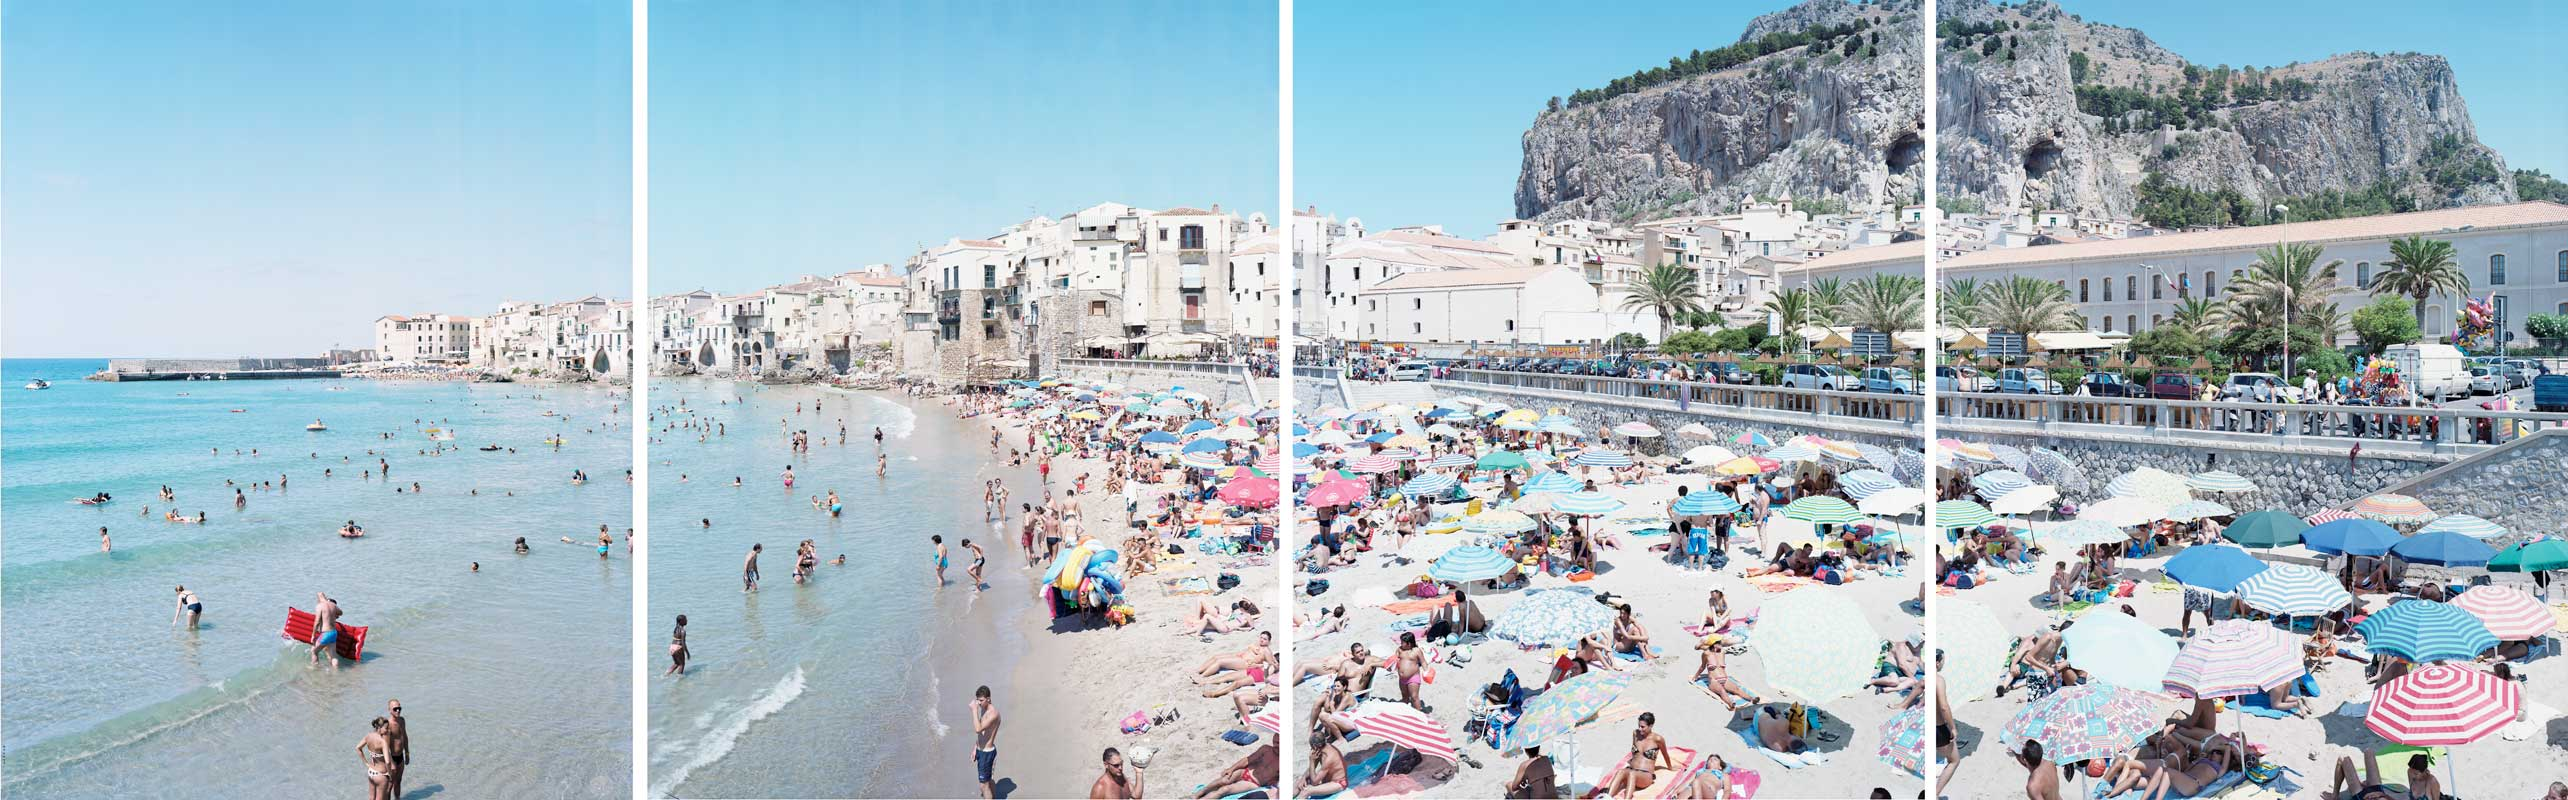 Massimo-Vitali_plage